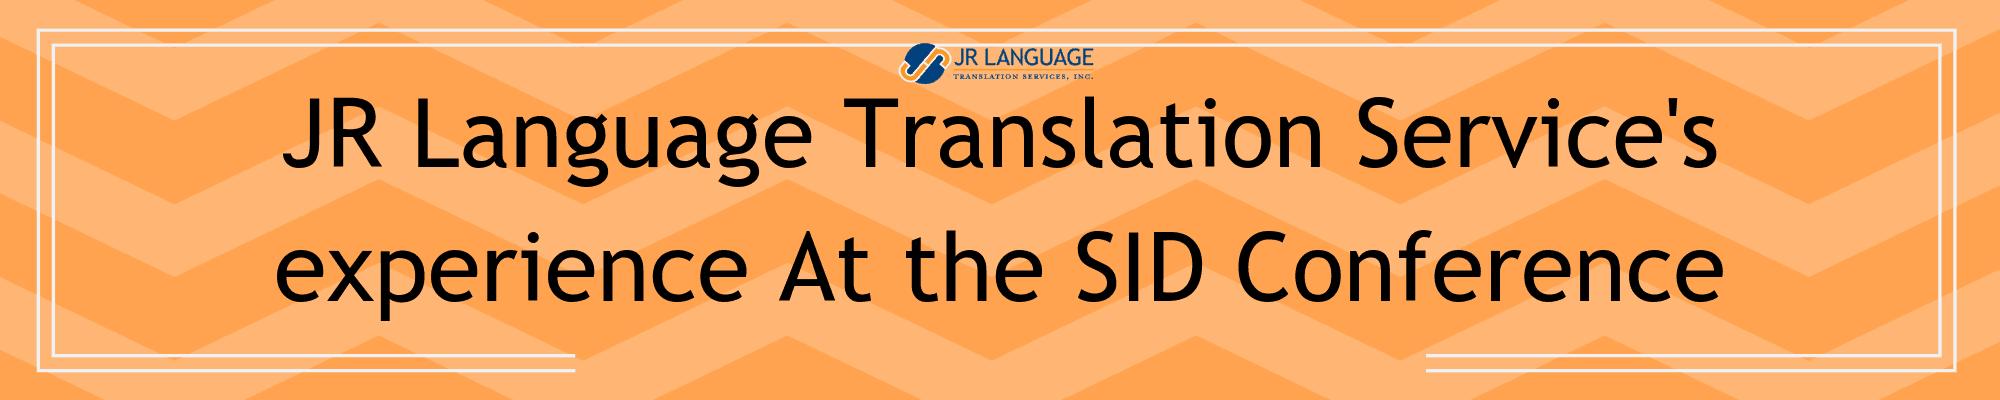 sid conference dc translation company